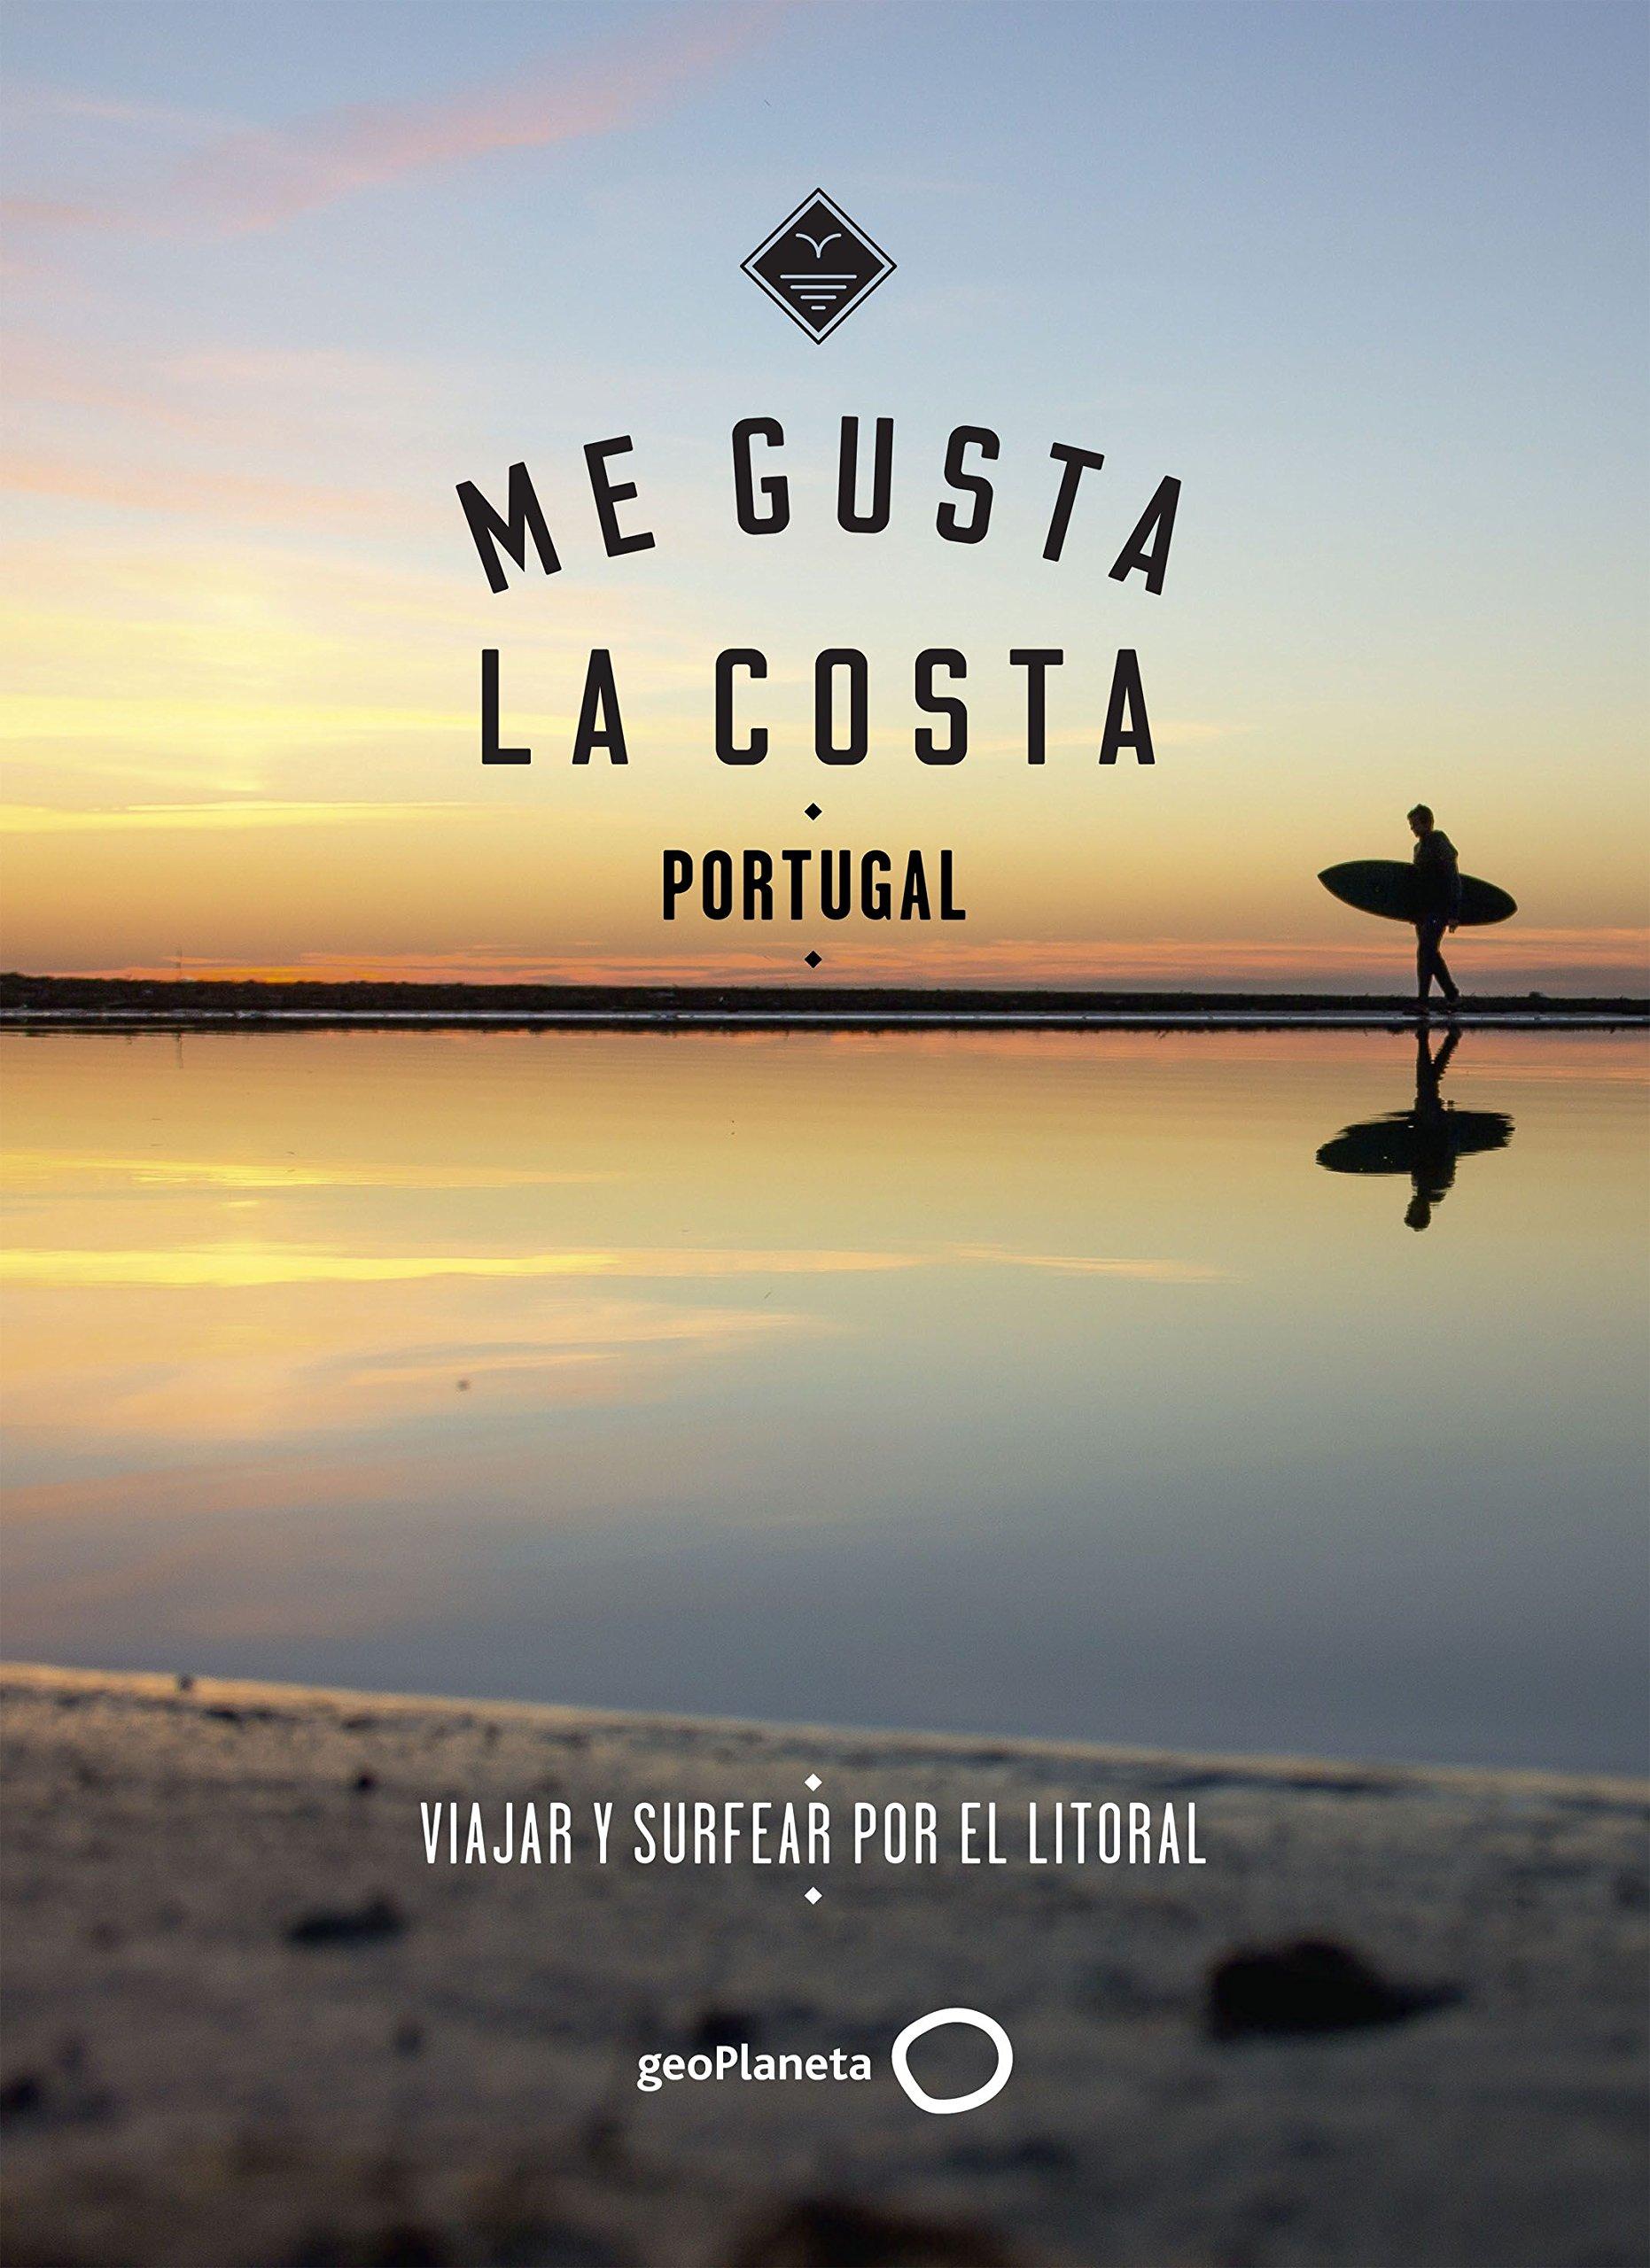 Me gusta la costa en Portugal (Deportes): Amazon.es: Gossink, Alexandra, Middelkoop, Geert-Jan, Fernández Gómez, Gonzalo: Libros